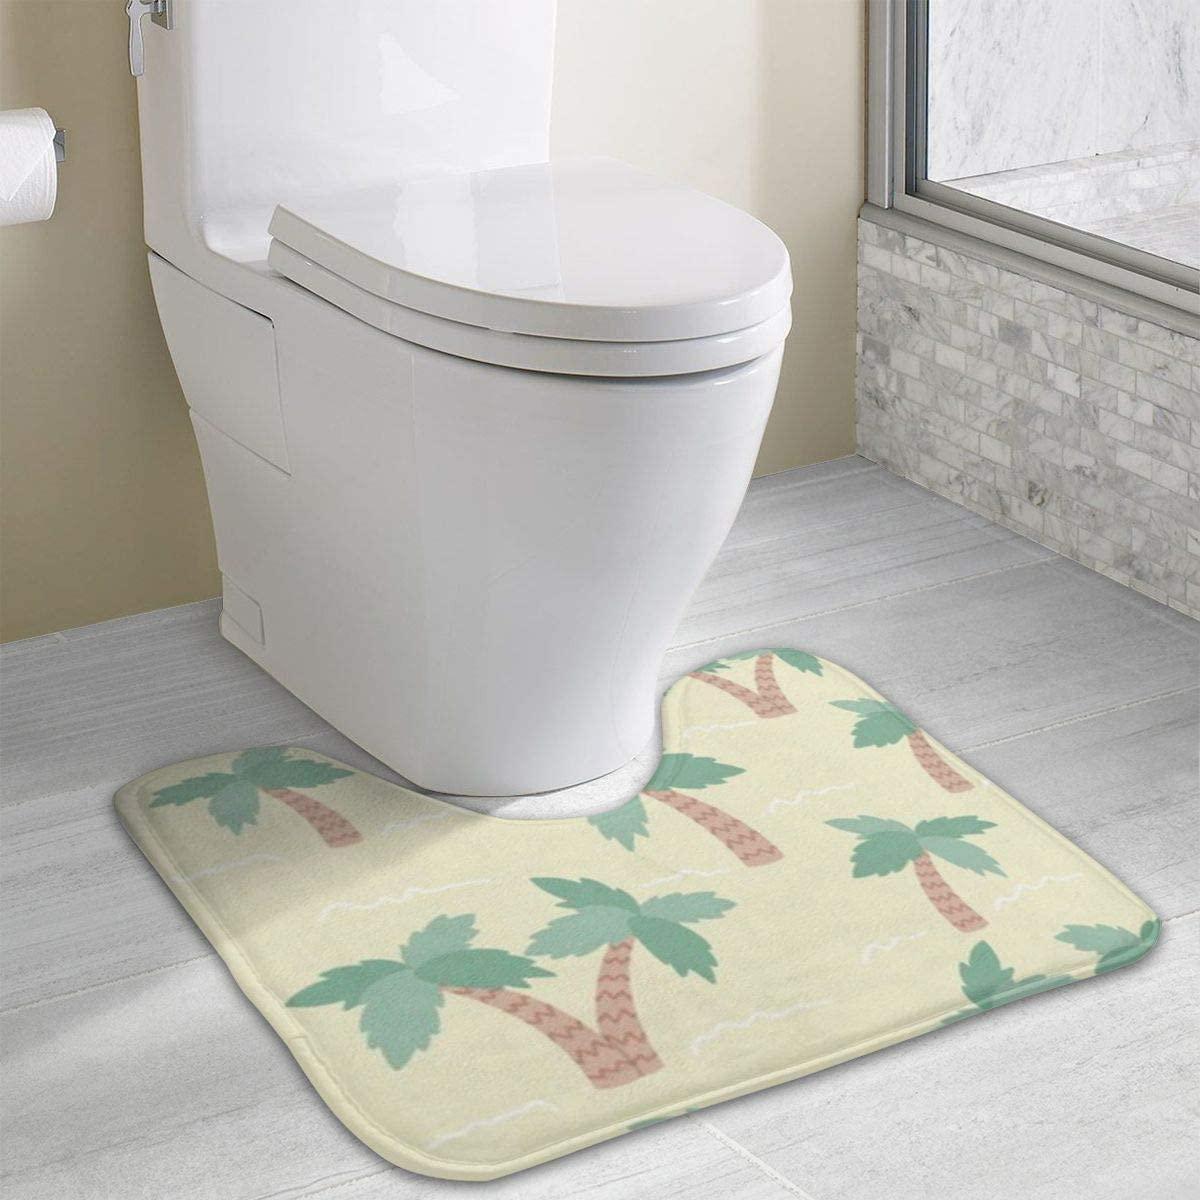 Bathroom Rug, Palm Tree U-Shaped Non Slip Absorbent Toilet Bath Floor Contour Doormat Shower Mat Carpet 19.3 X 15.7 Inch